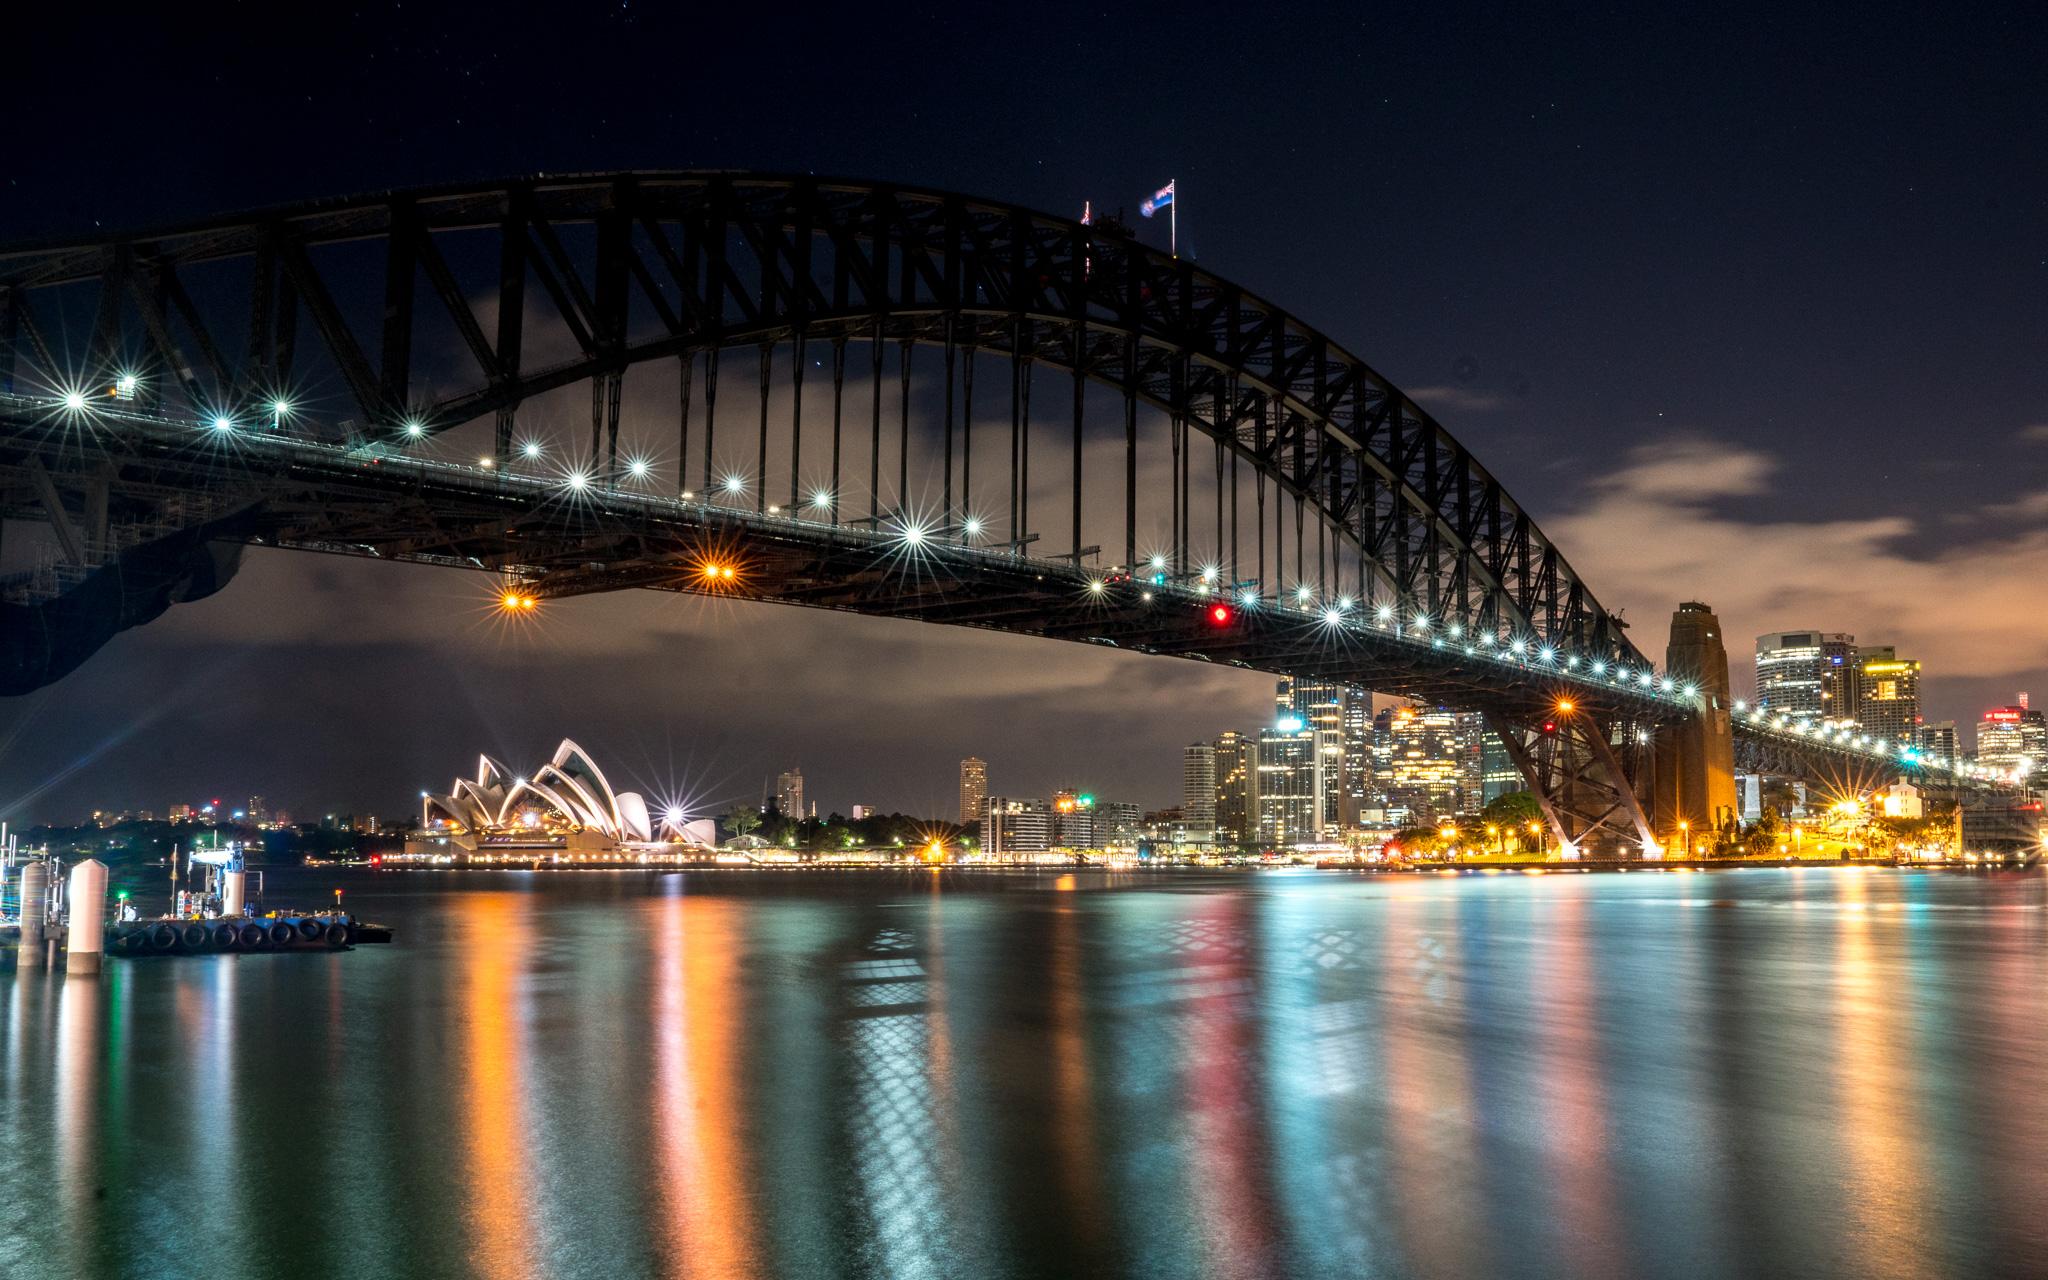 Sydney Opera and Harbour Bridge at night